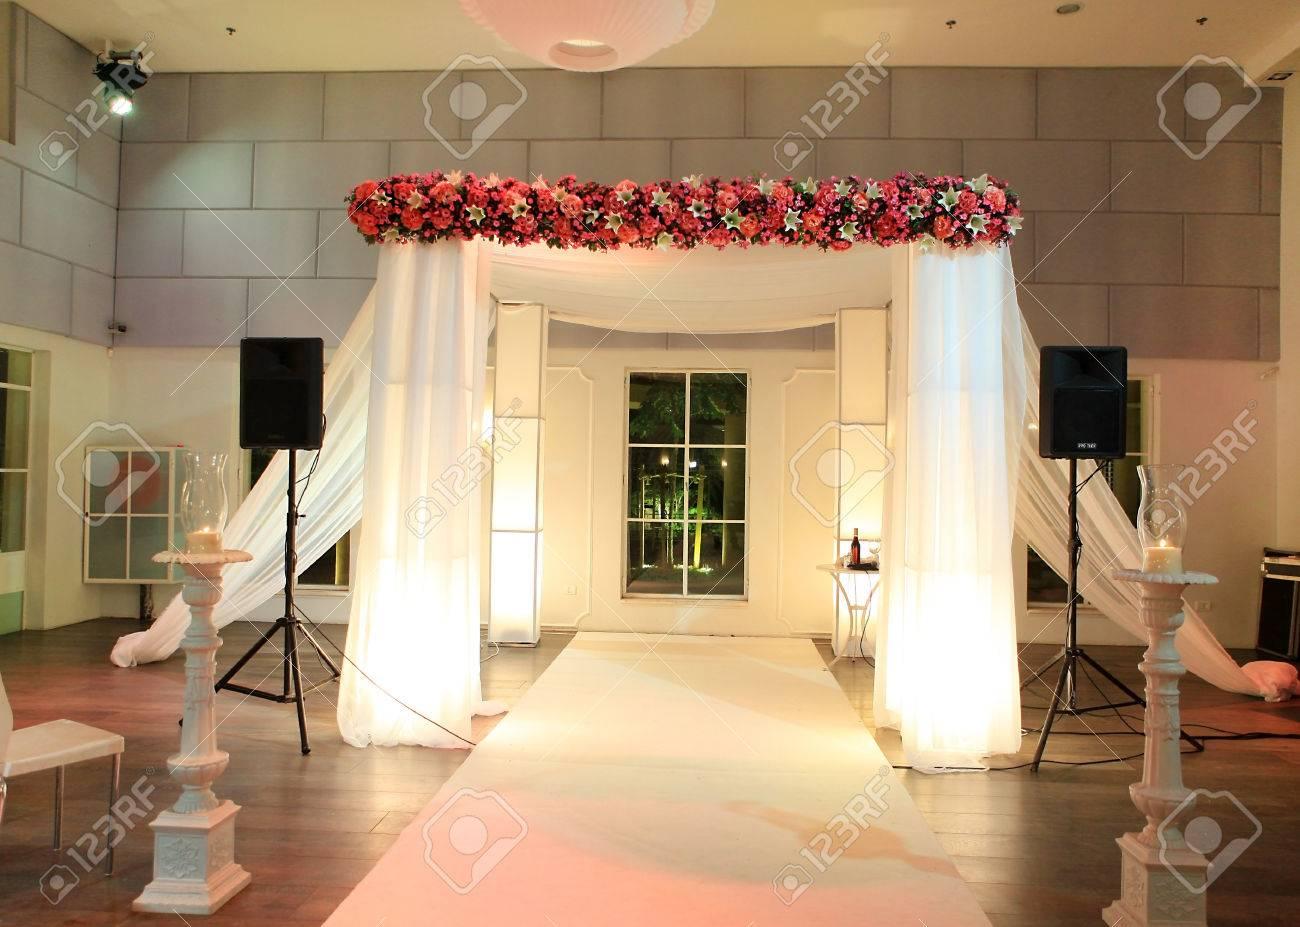 jewish traditional wedding ceremony wedding canopy chuppah or huppah in jewish tradition Stock Photo - 25902366 & Jewish Traditional Wedding Ceremony Wedding Canopy Chuppah.. Stock ...